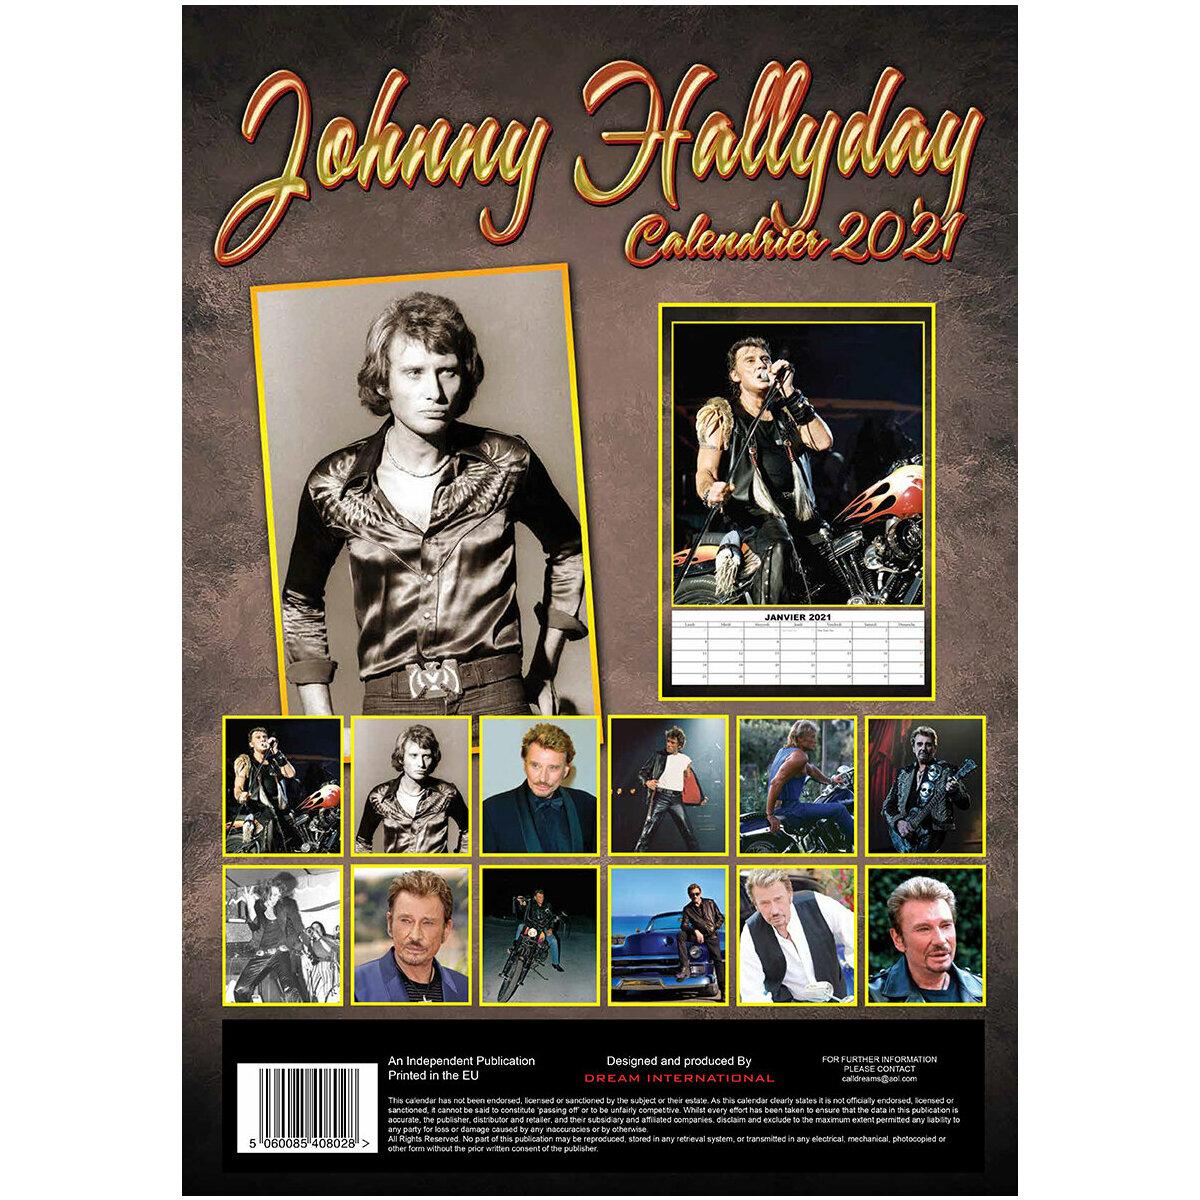 Calendrier Johnny Hallyday 2021 La Poste Calendrier 2021 Johnny Hallyday format A3